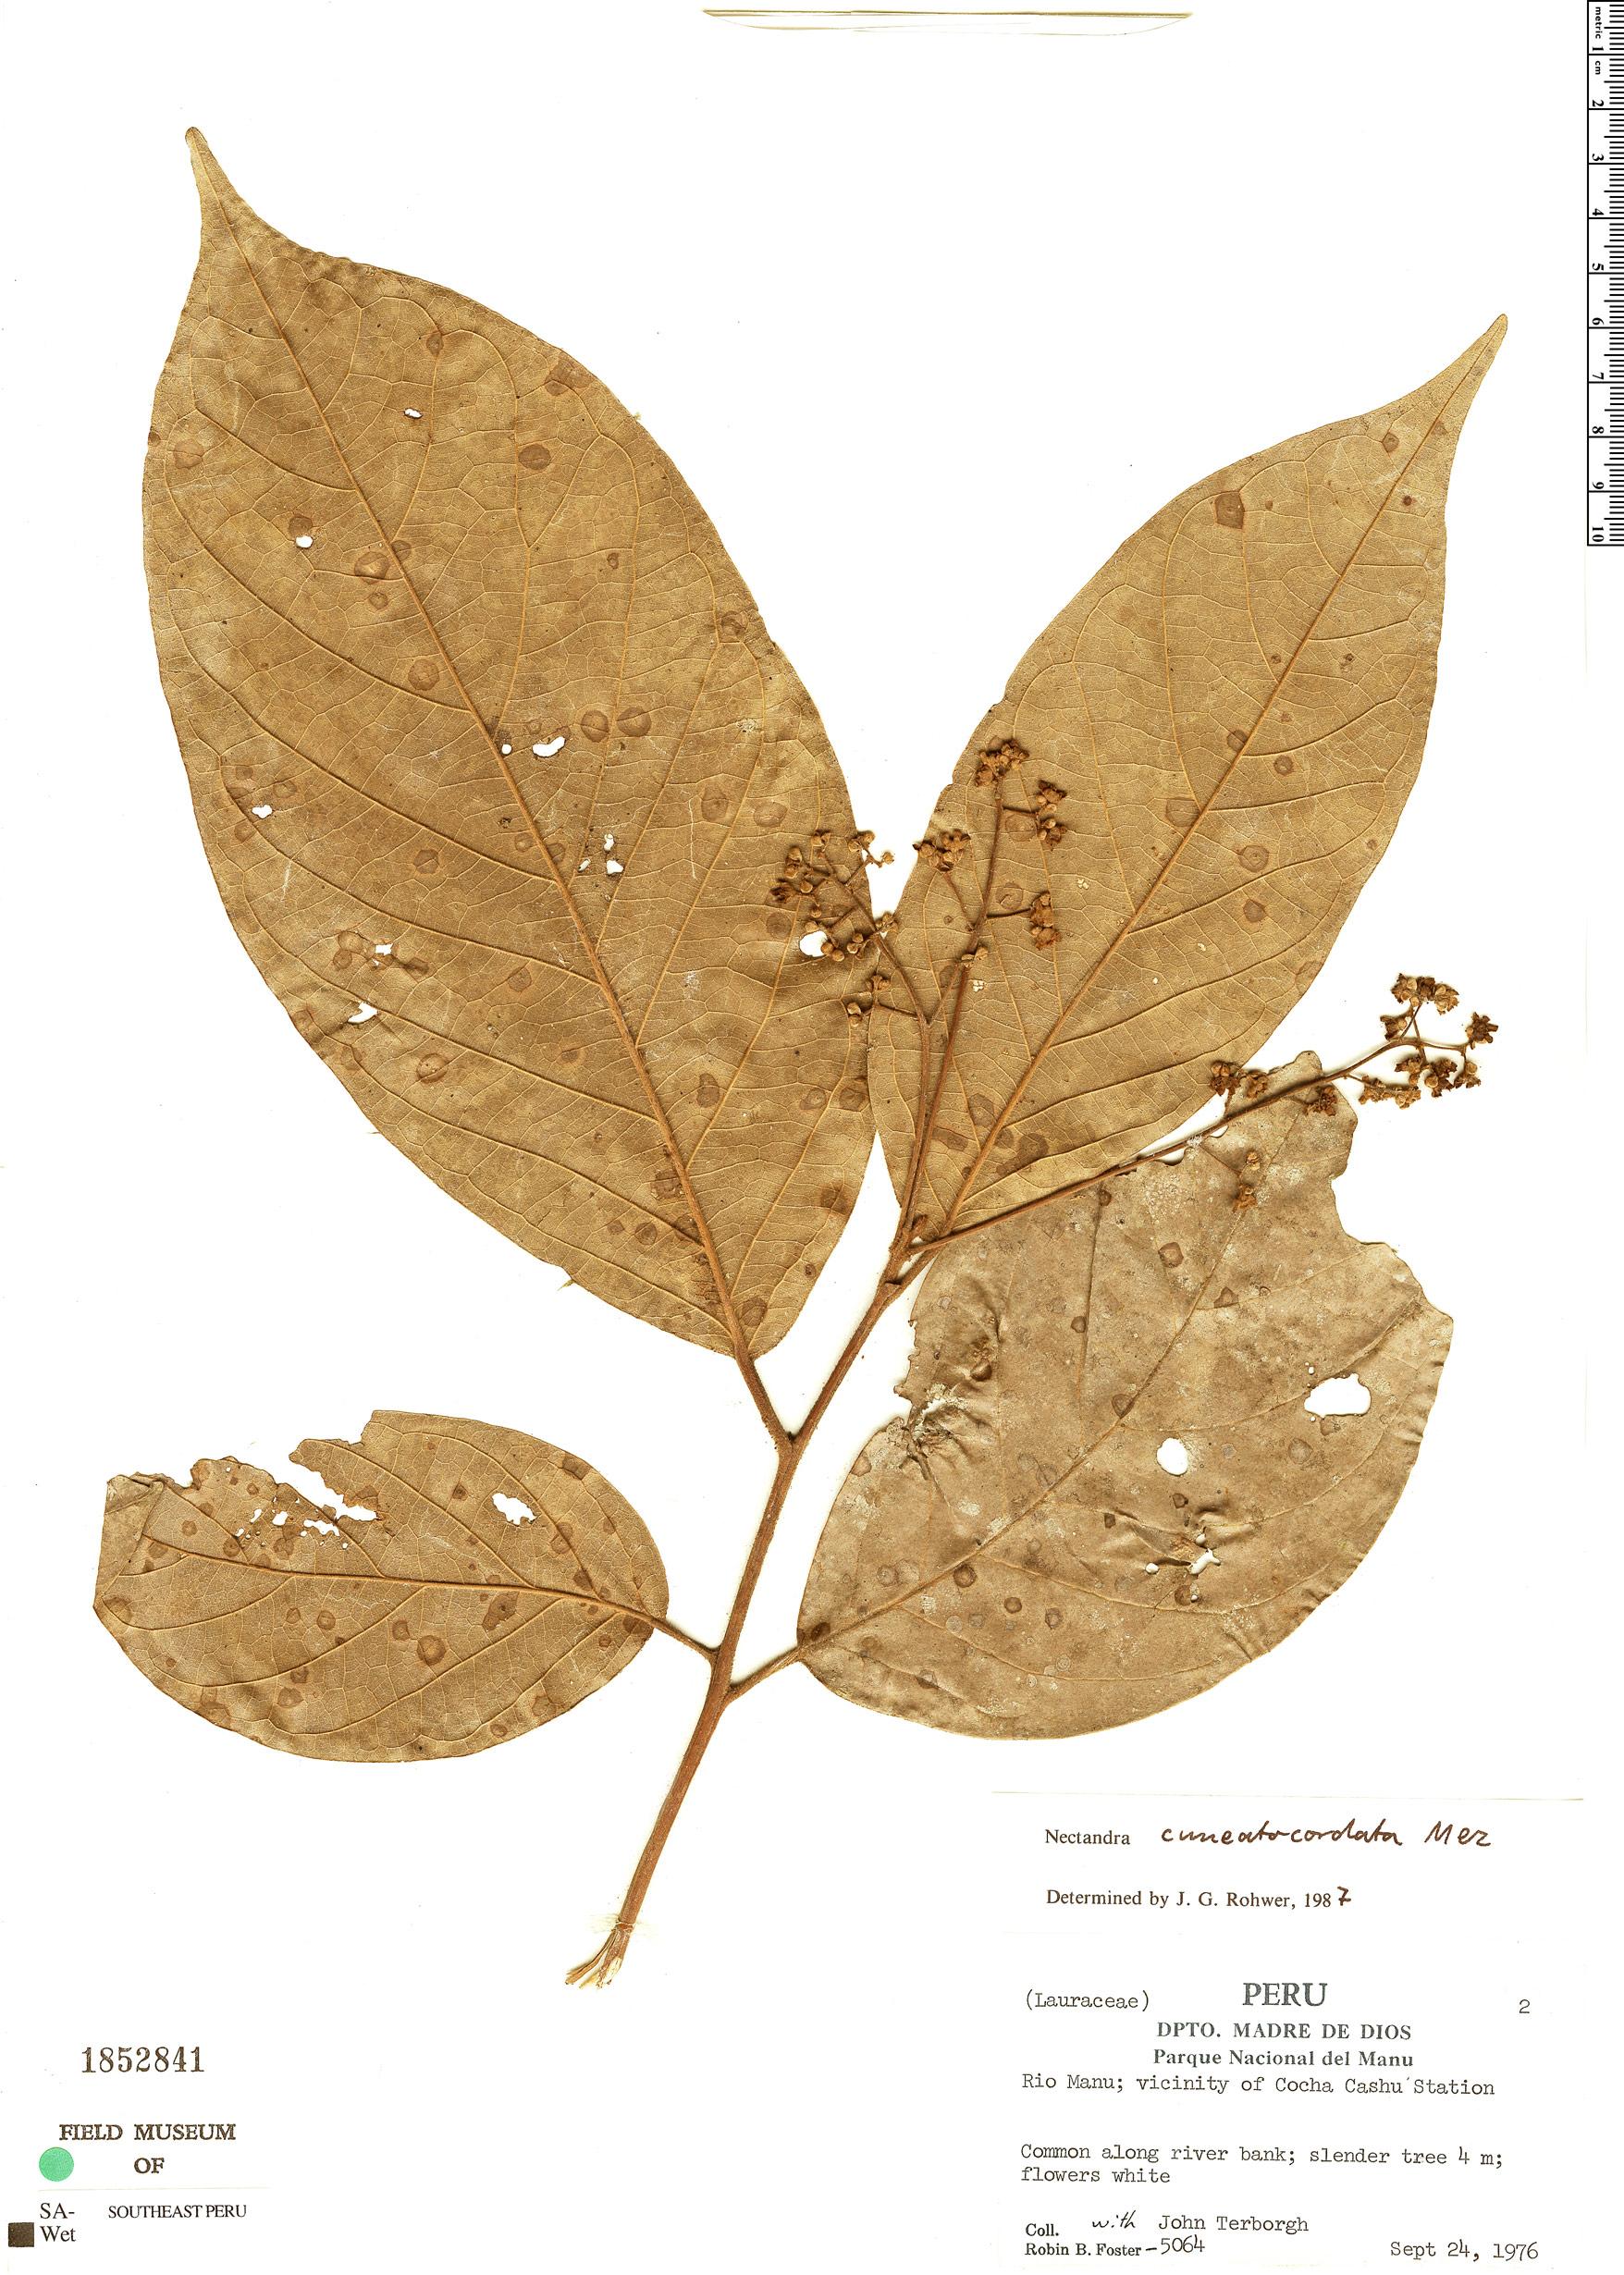 Espécimen: Nectandra cuneatocordata